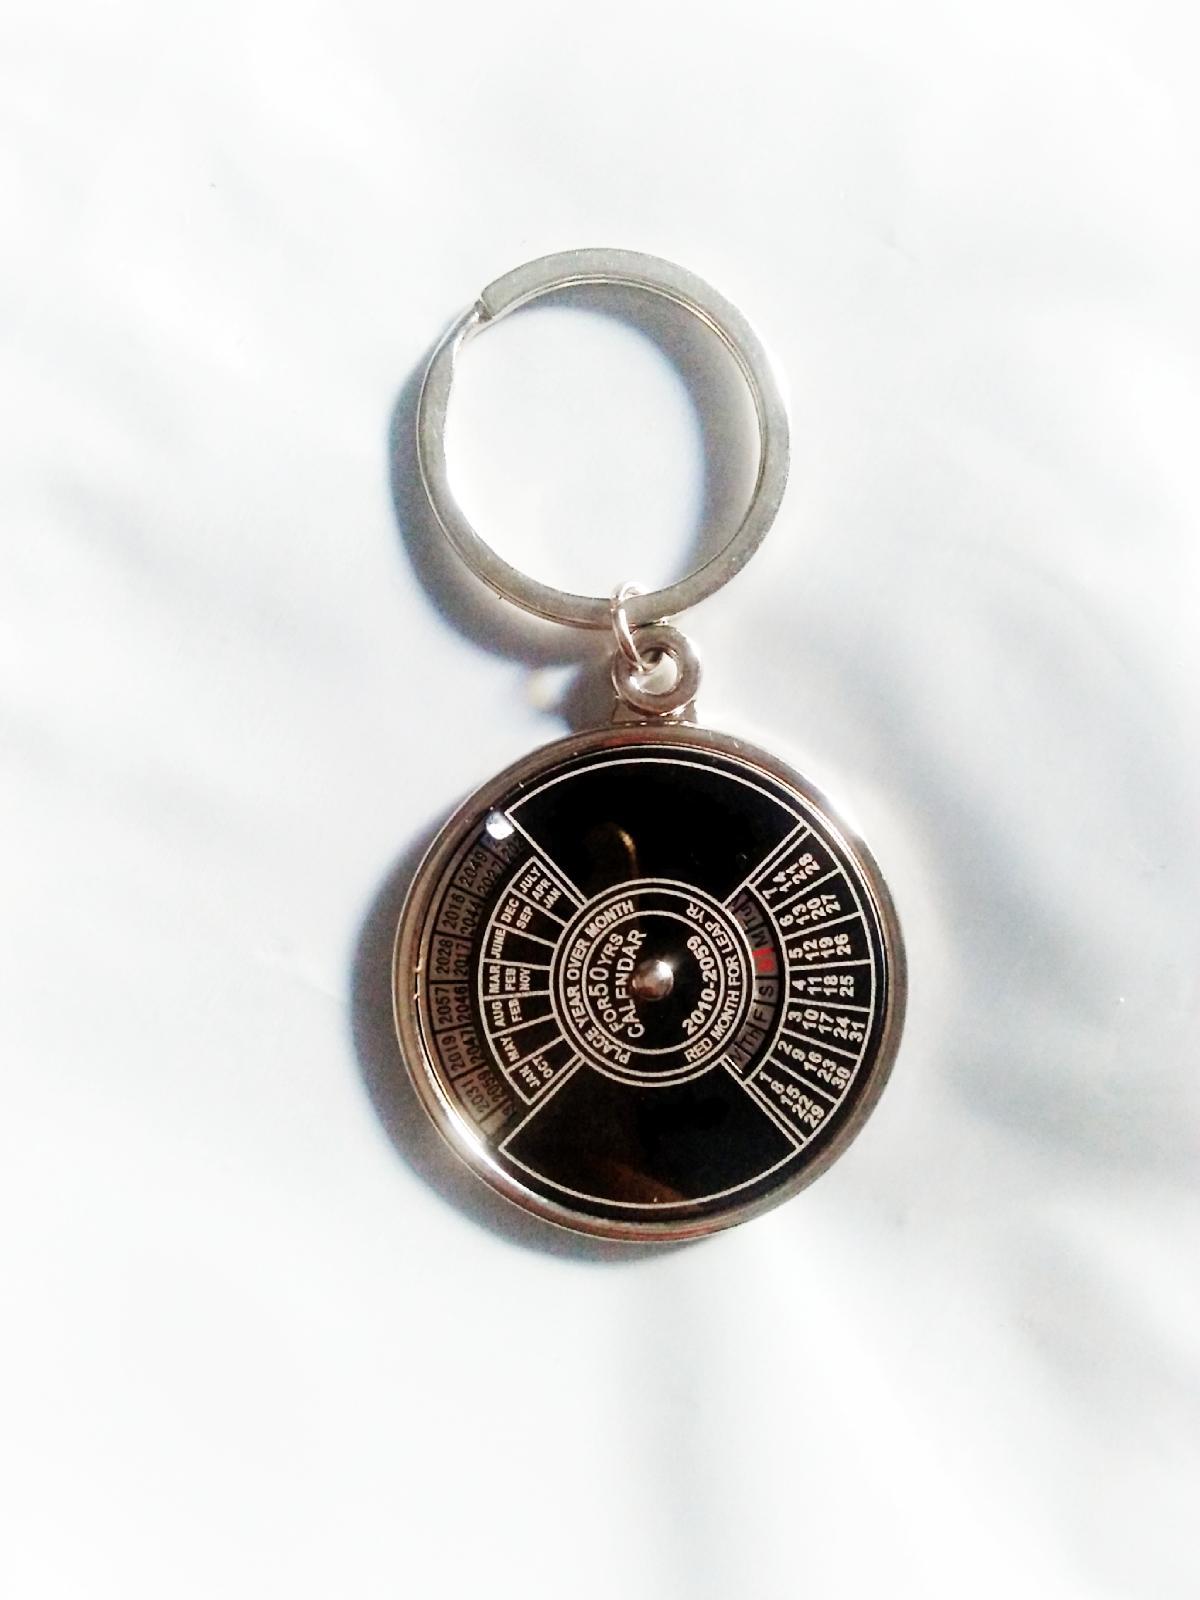 50 Years Perpetual Calendar Keychain Key Ring Metal Slim Design